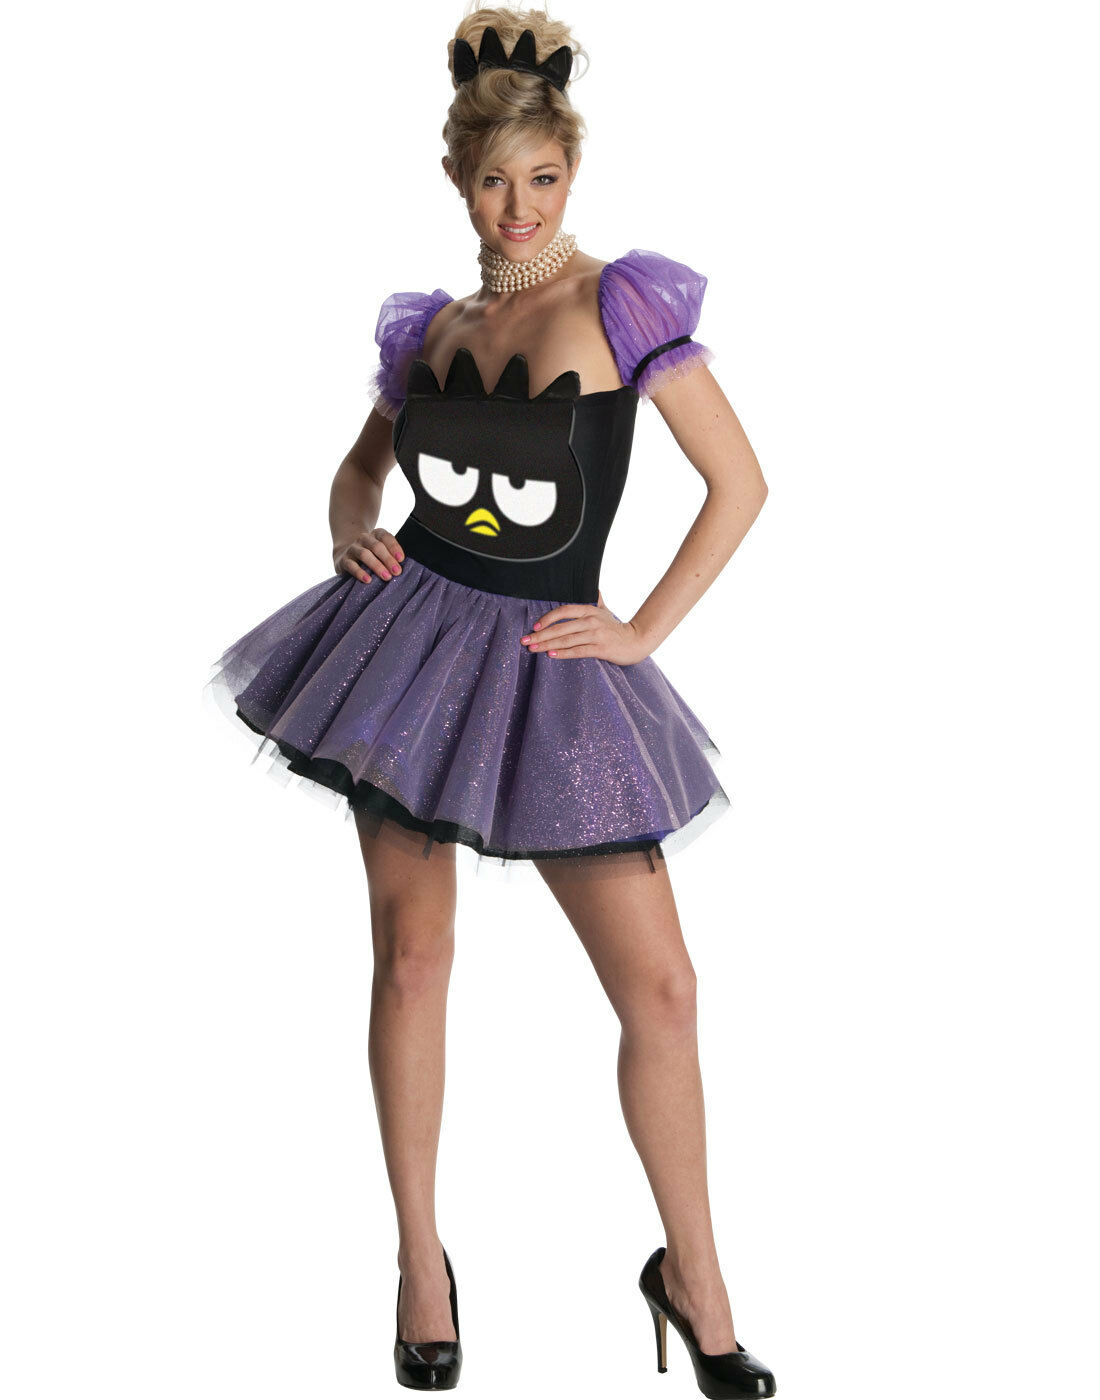 Sexy Mauve Badtz Maru Femmechot Femmechot Femmechot Robe Hello Kitty DéguiseHommes t Halloween Costume 8d30f7